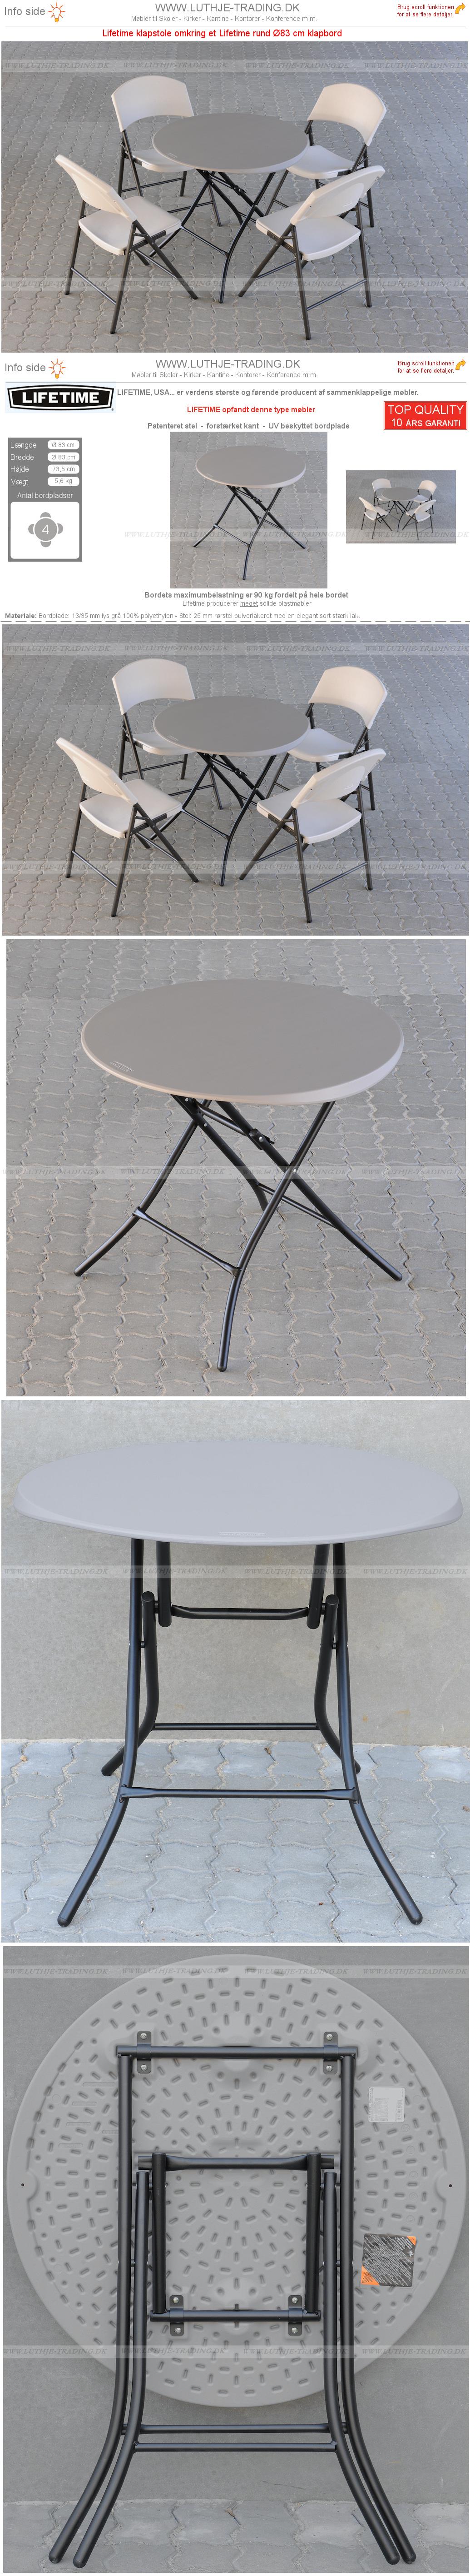 Rundt klapbord opstilling m. klapstole 3